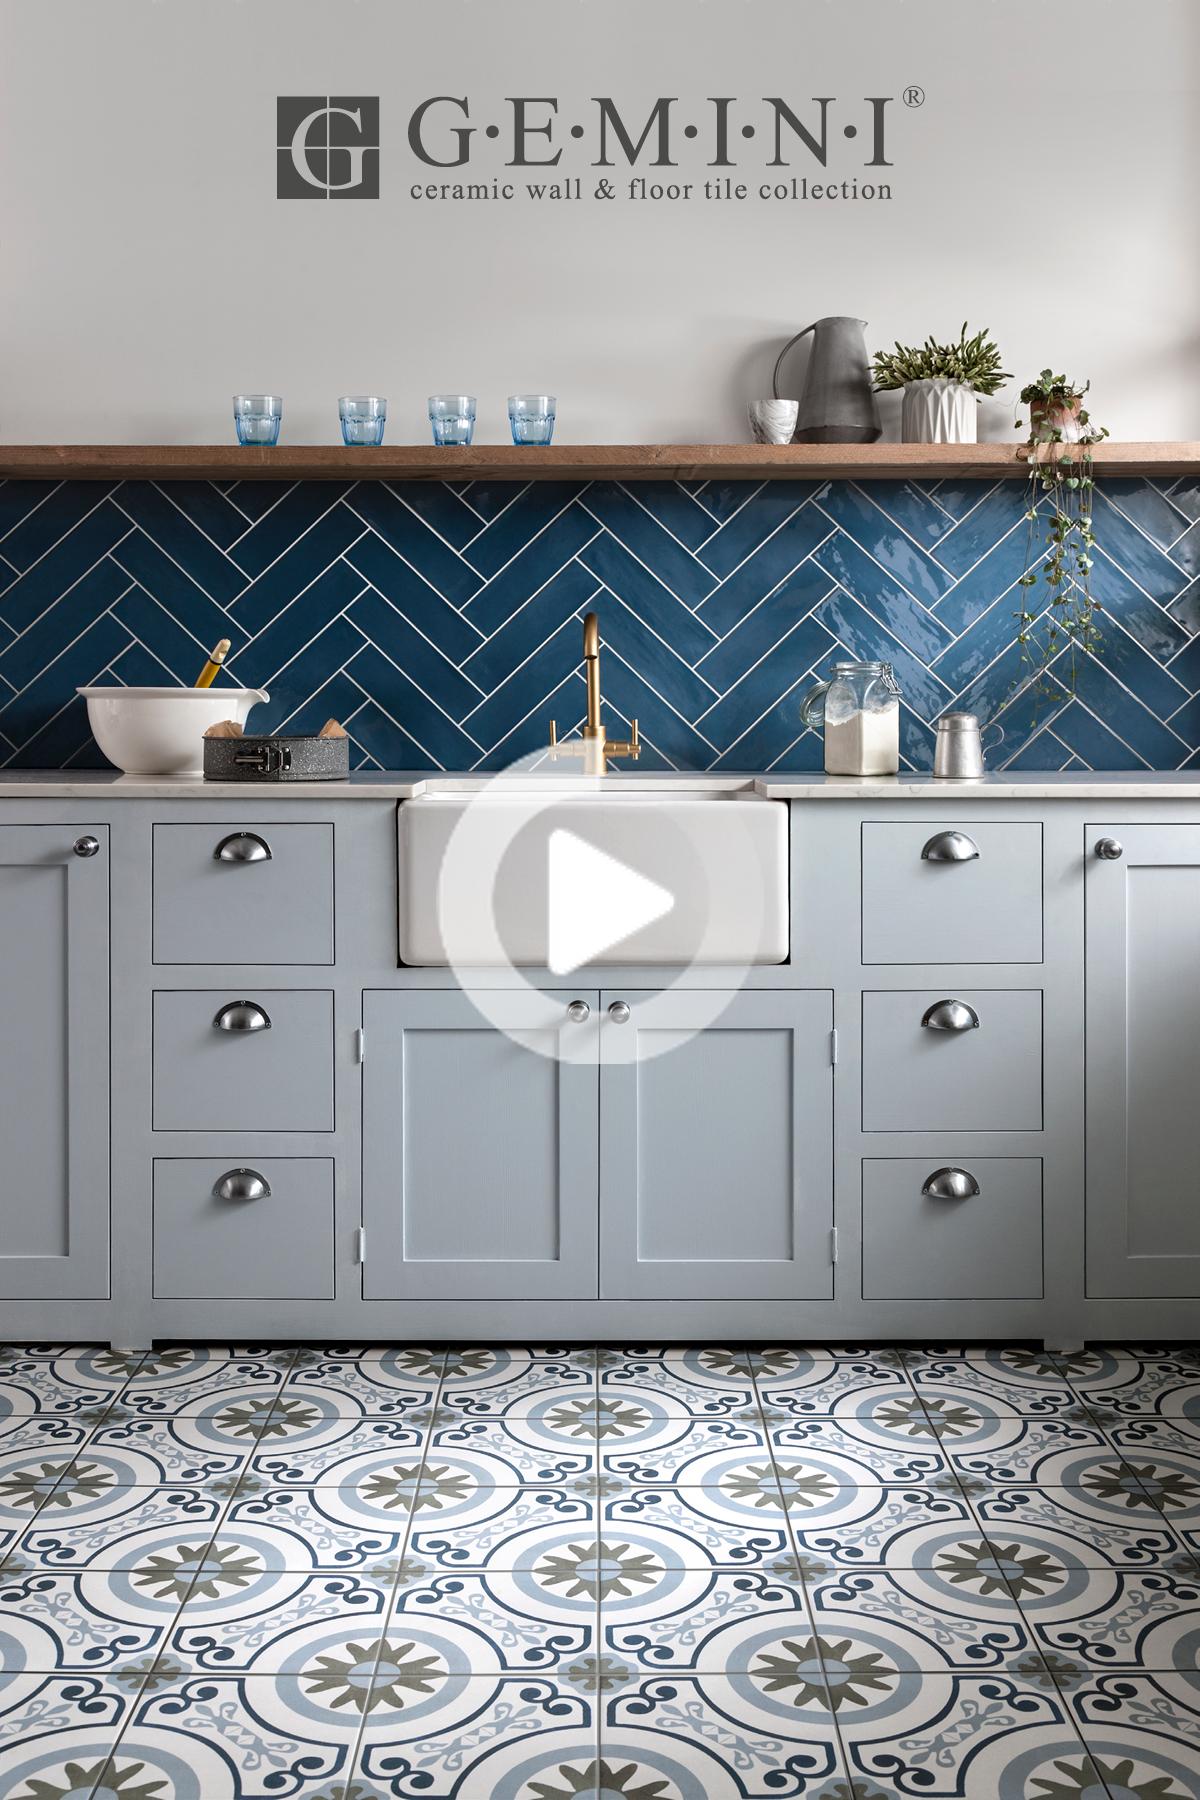 Idee Per La Cucina 37+ idee per pavimenti cucina per la cucina perfetta, trend